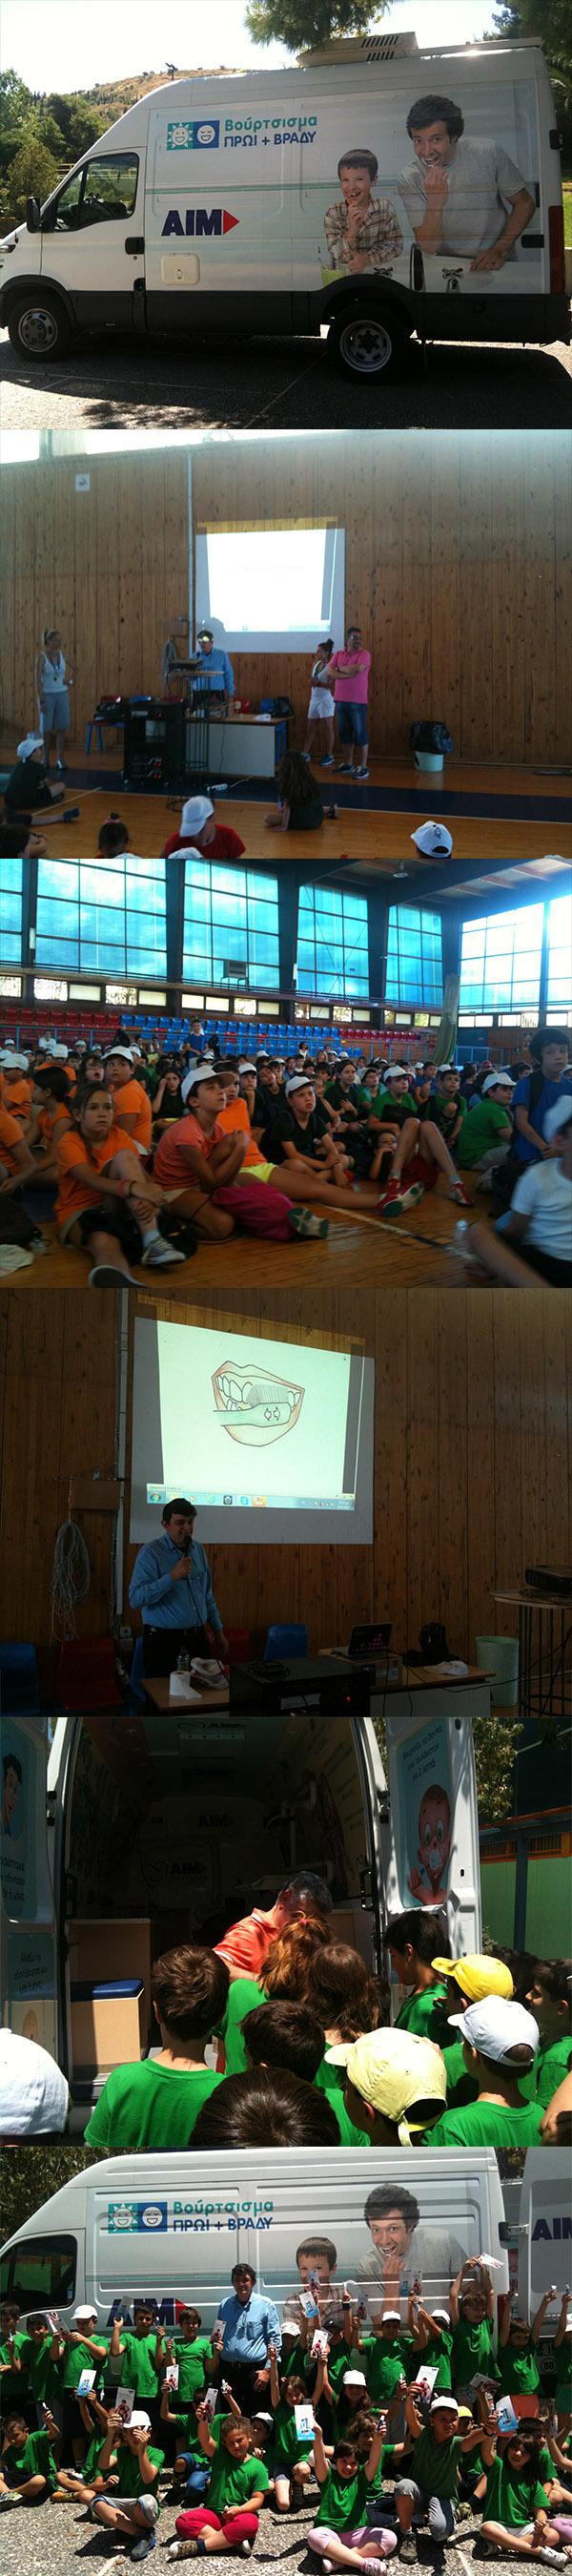 aim-sto-active-kids-summer-camp-2014-photos